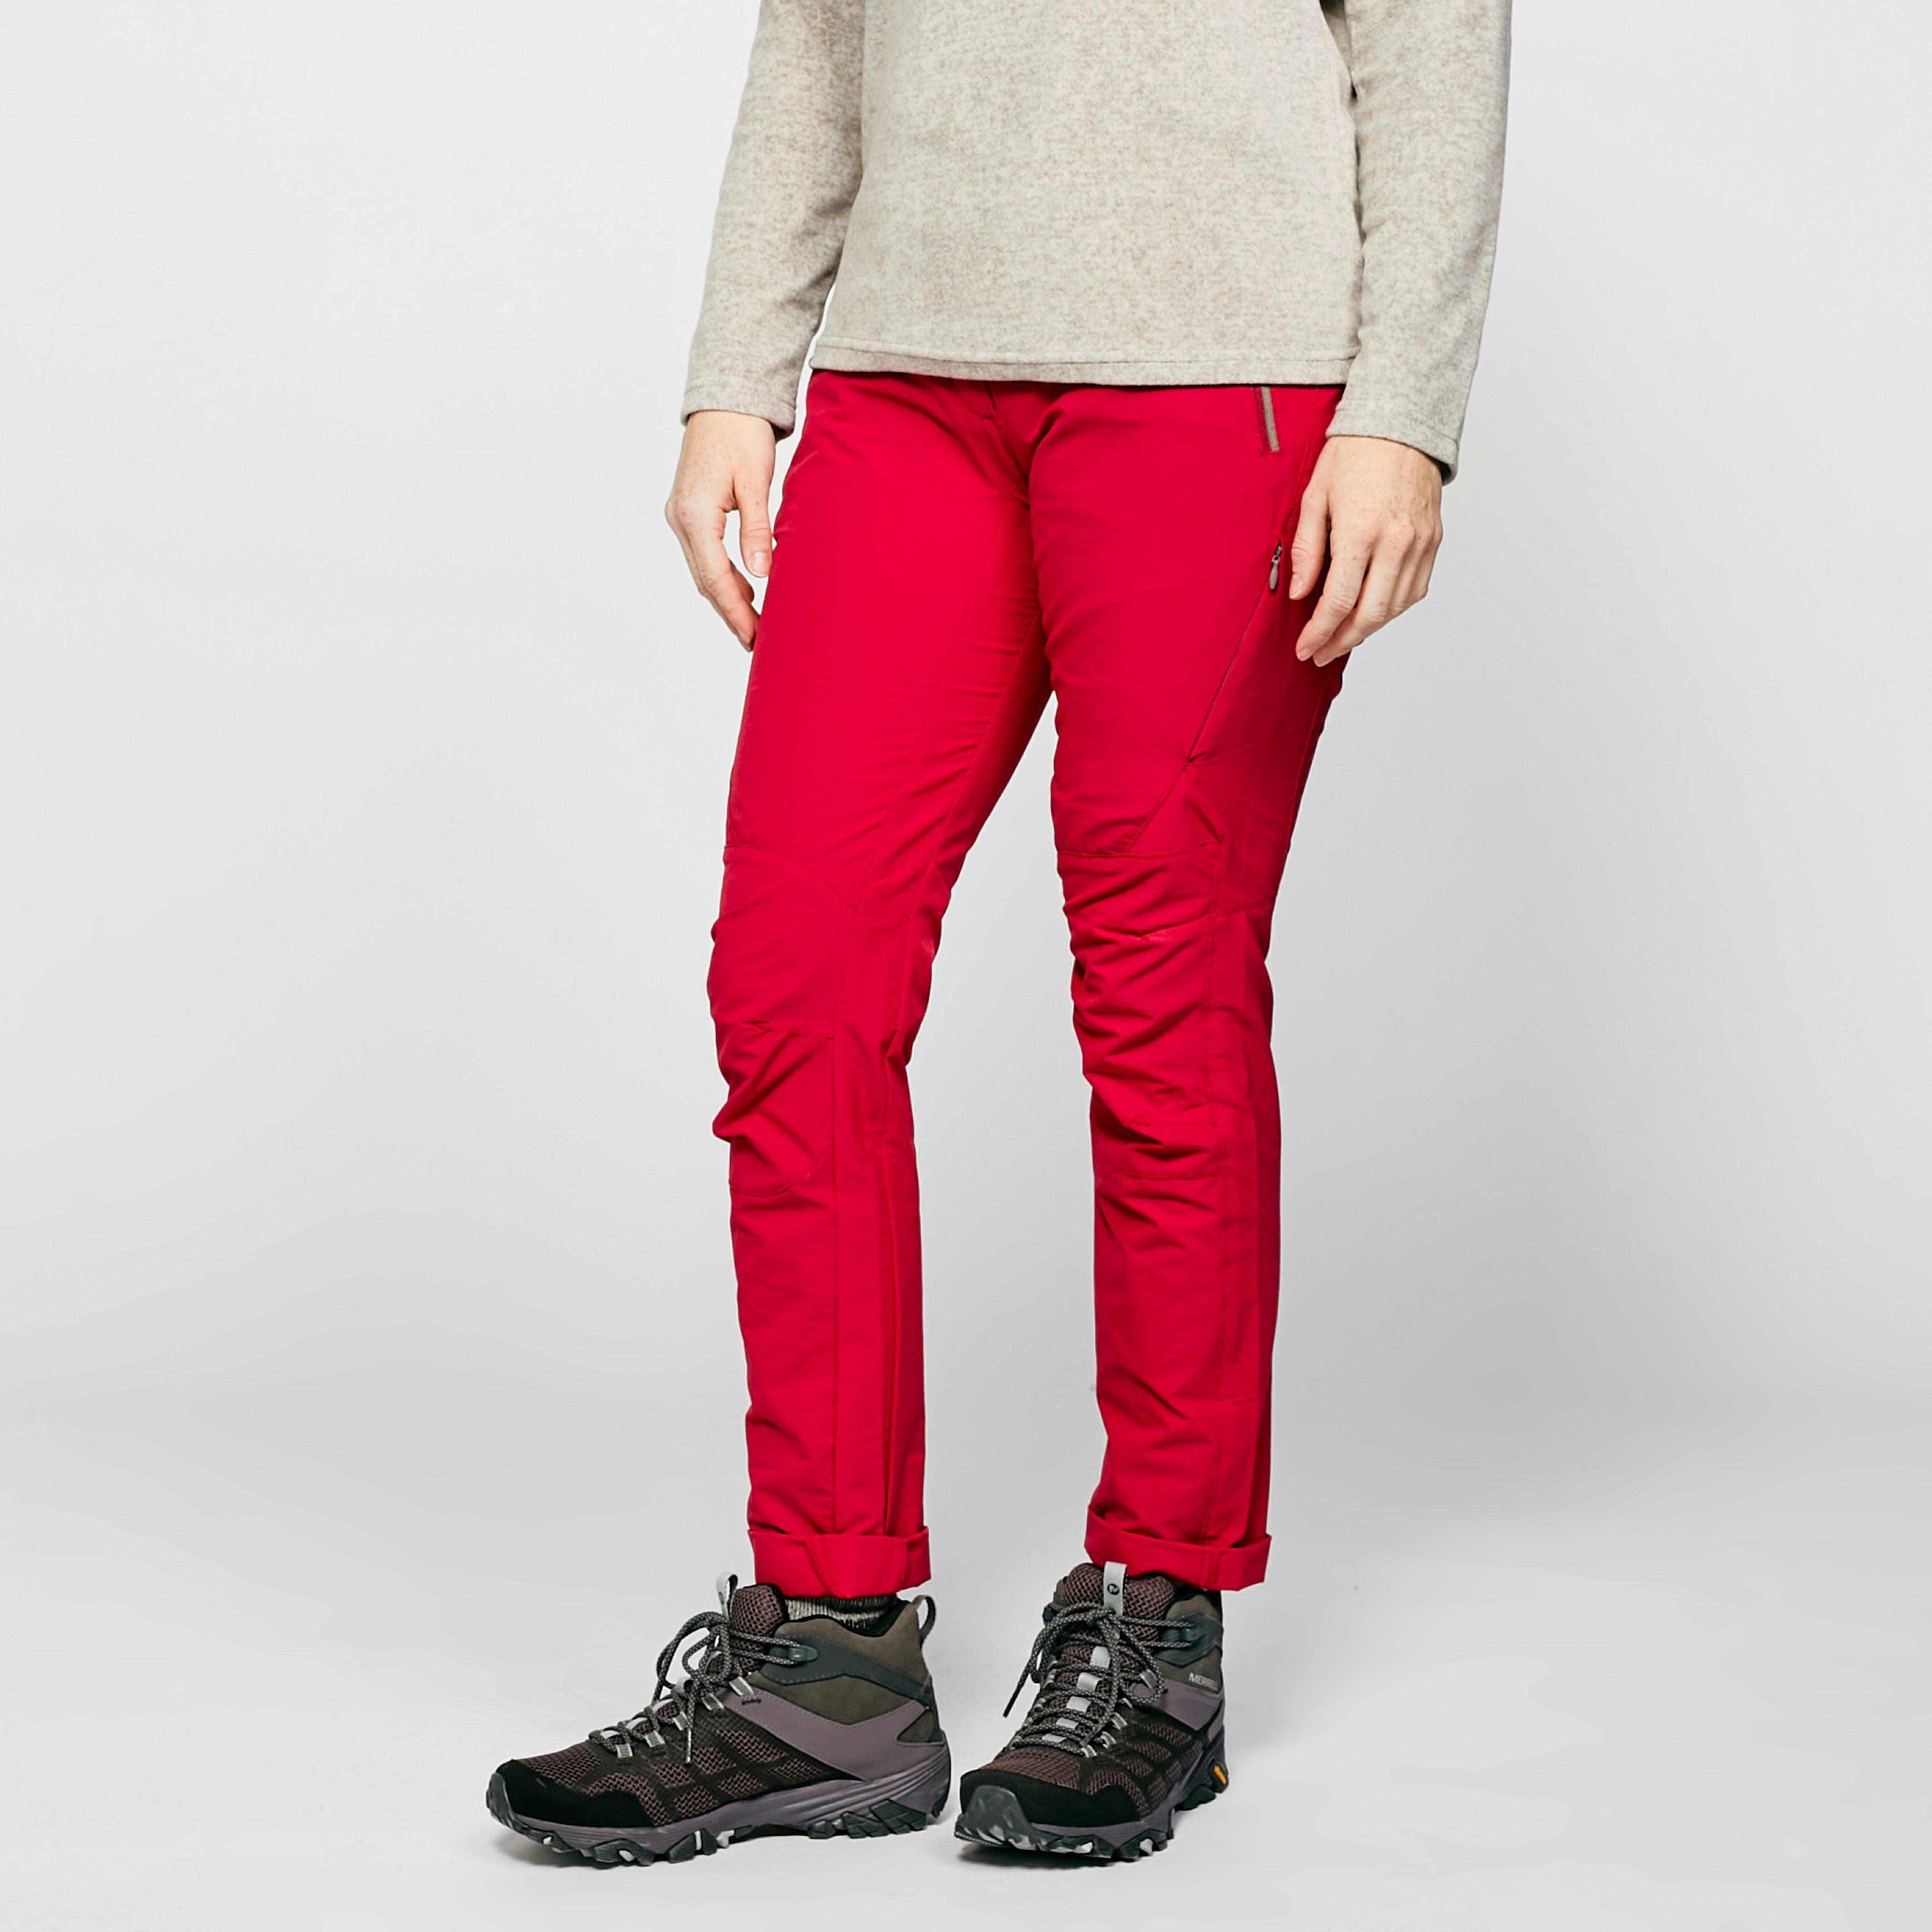 Regatta Womens's Highton Trousers - Pink/Pnk, Pink